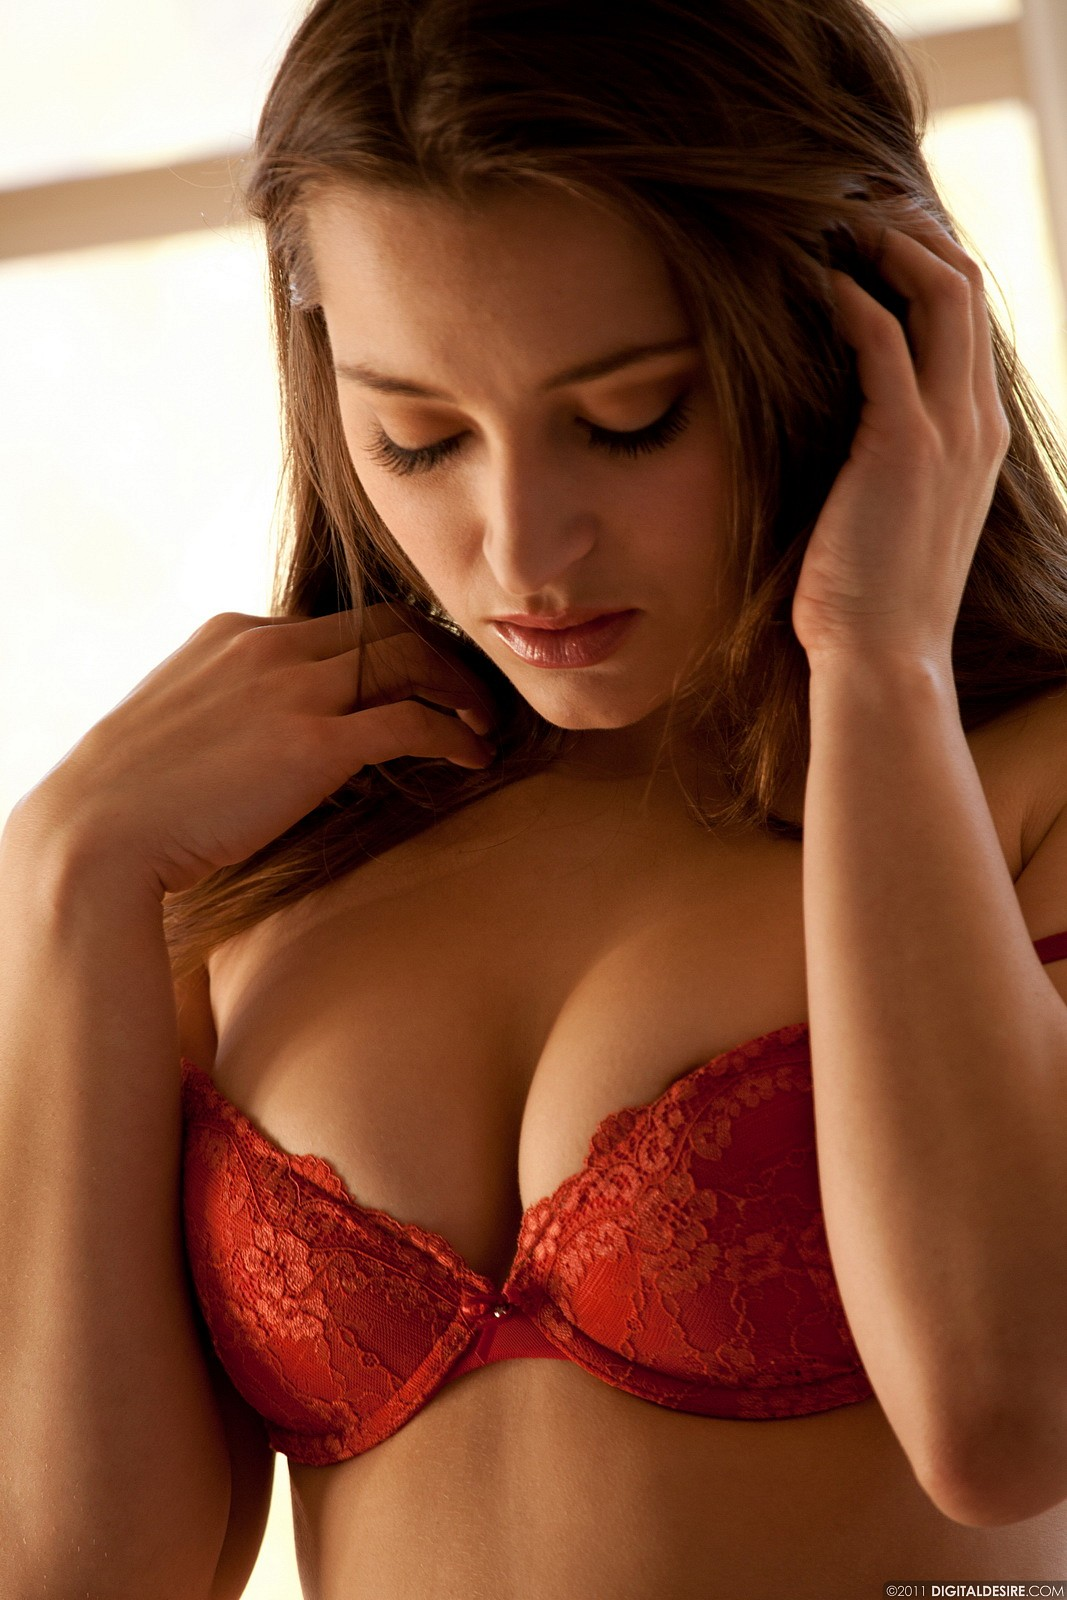 Dani Daniels Takes Off Her Red Top 692-8620